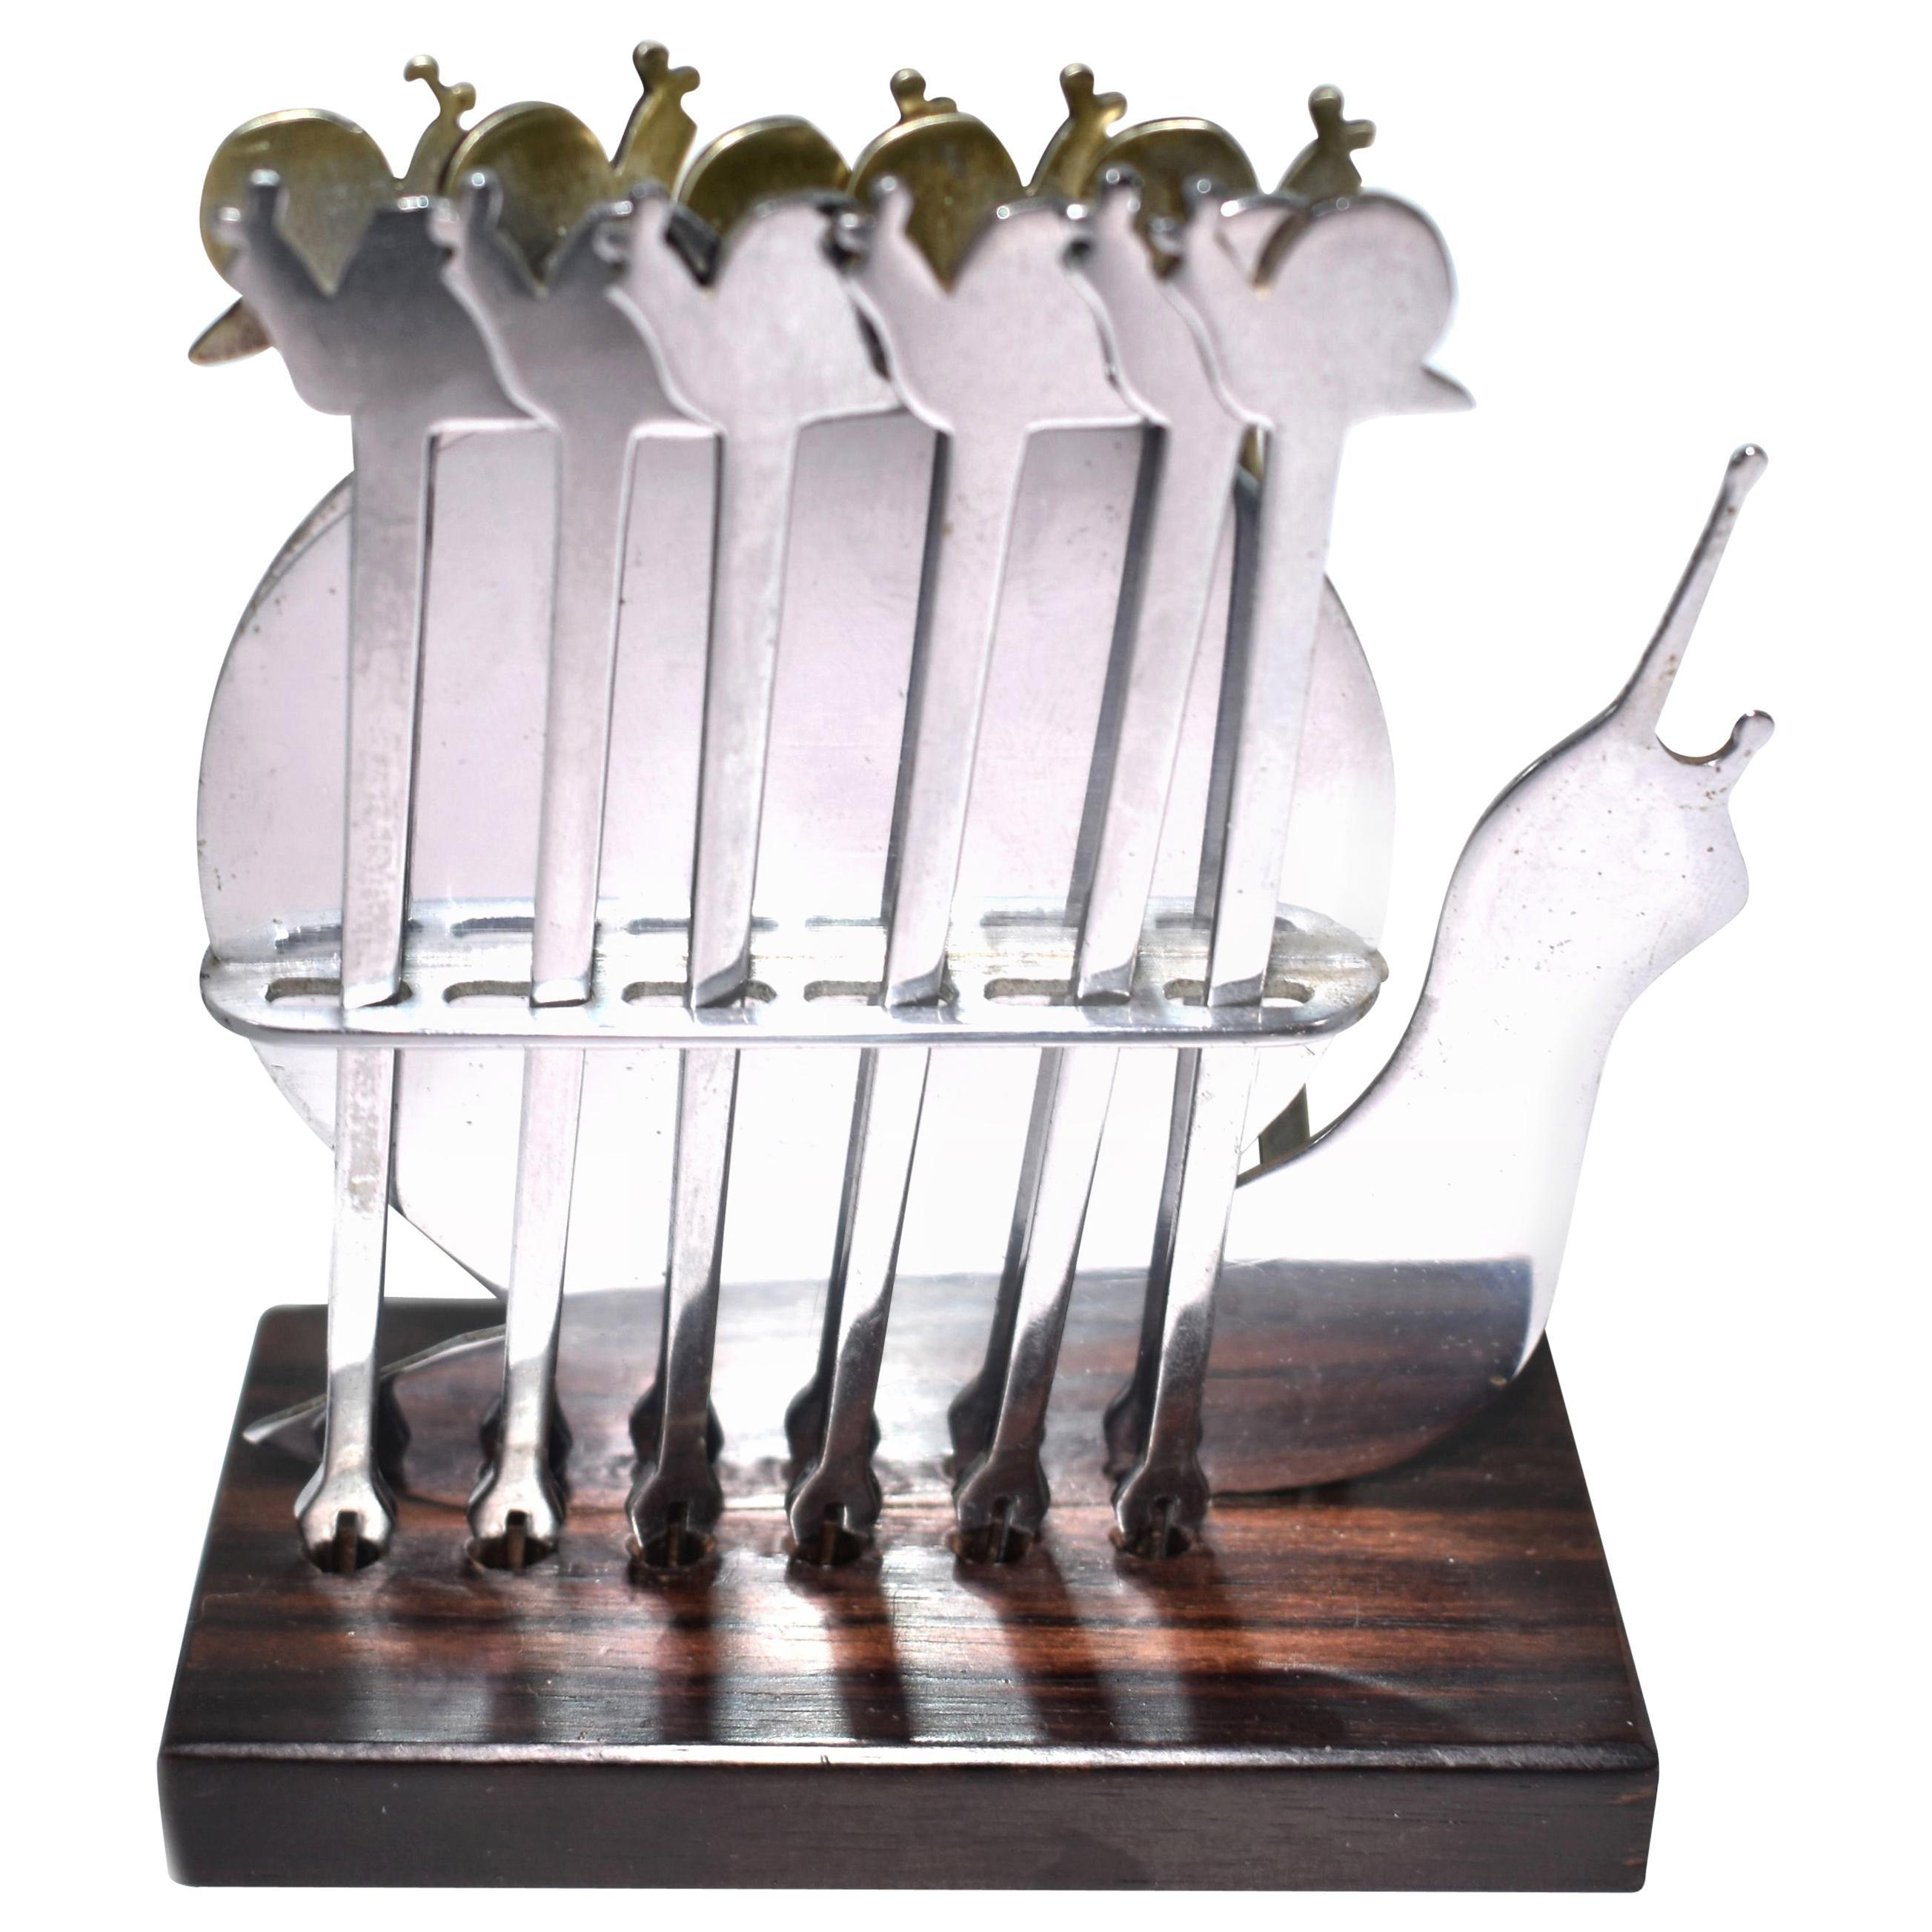 Art Deco Chrome Snail Novelty Cocktail Stick Set